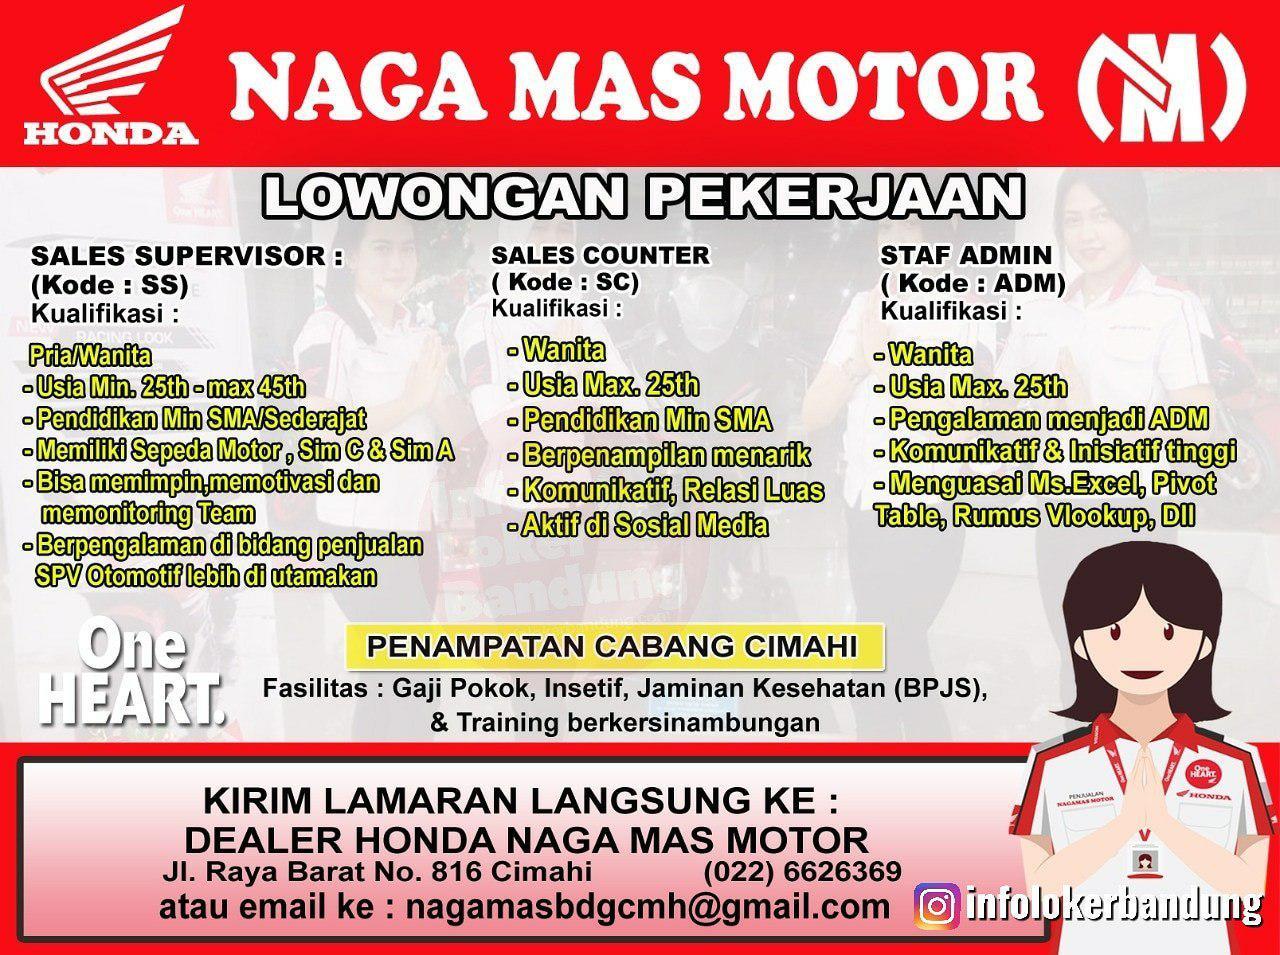 Lowongan Kerja Naga Mas Motor Cimahi Bandung April 2019